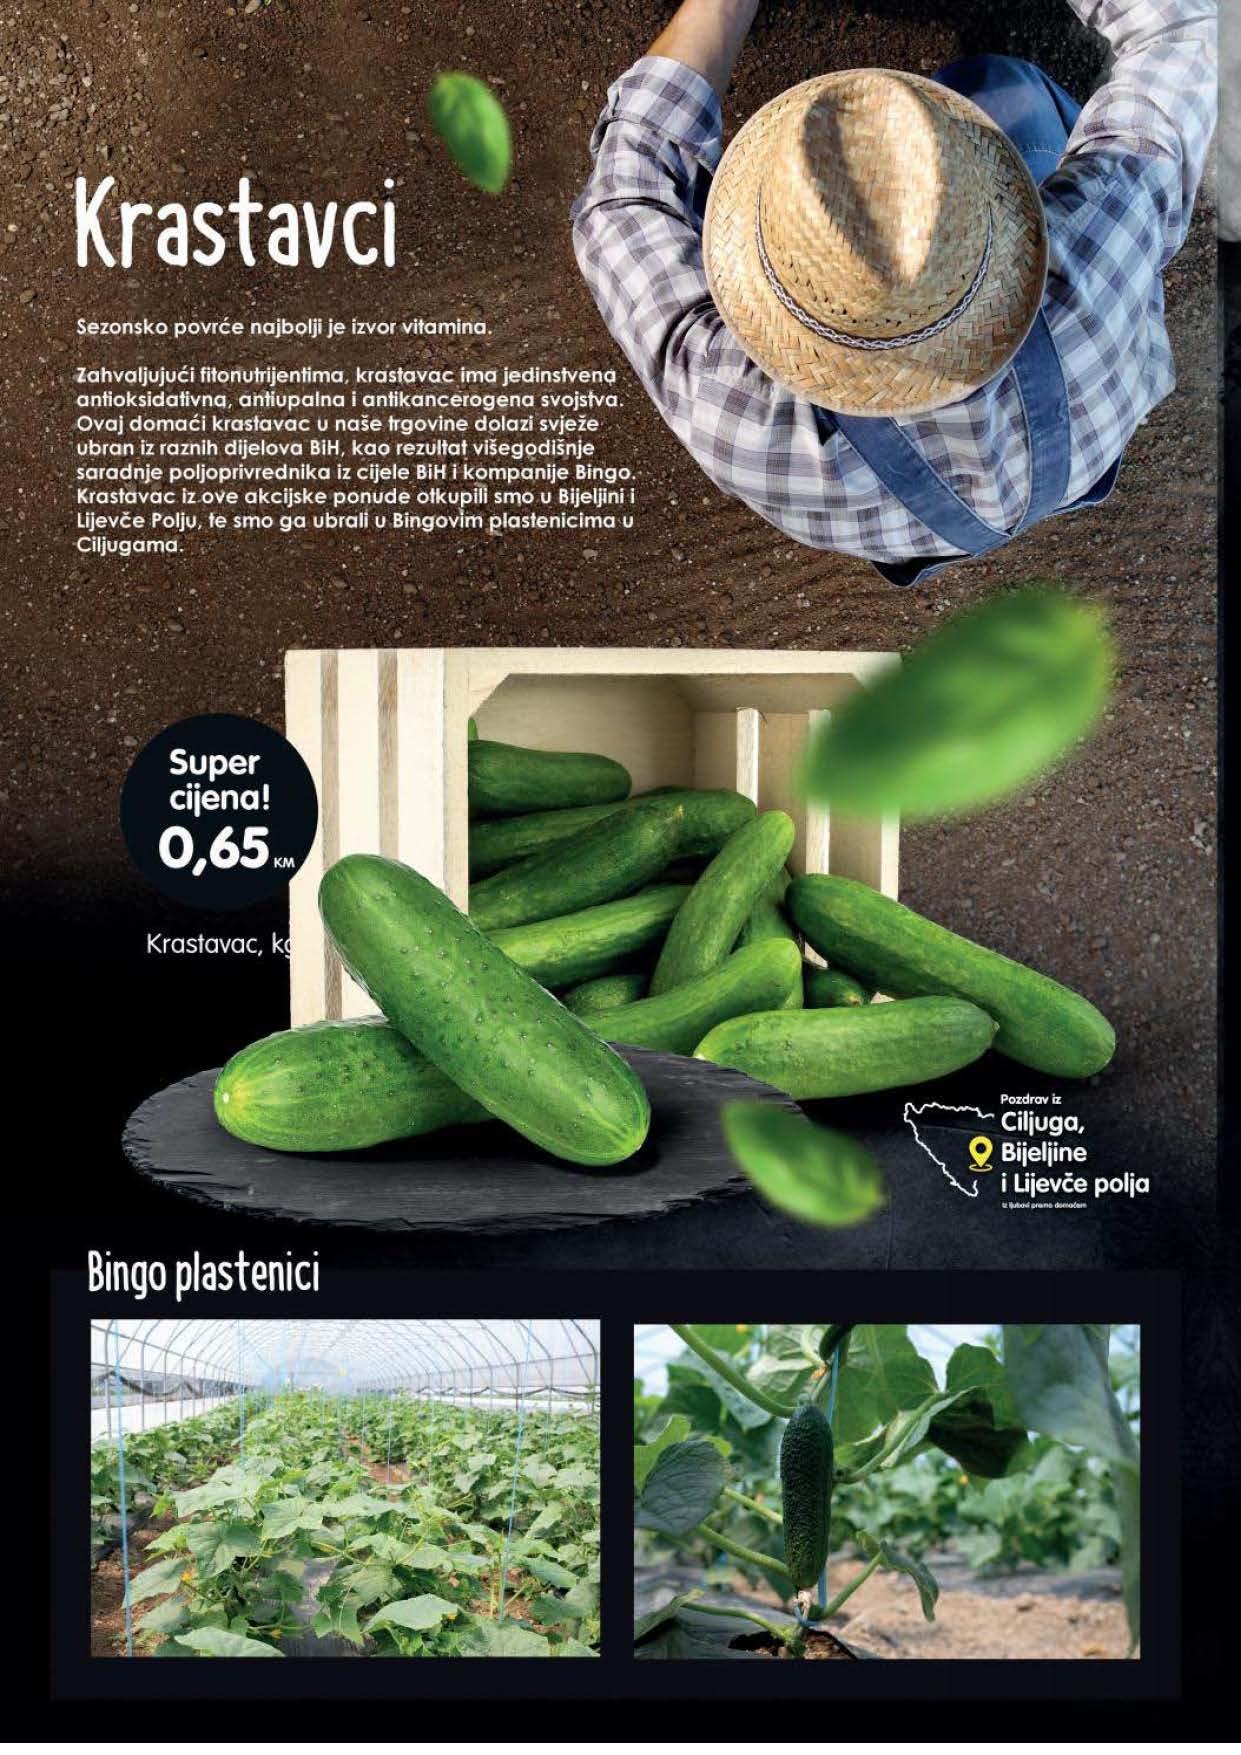 BINGO Katalog Kupuj pametno kupuj domace JUN JUL 2021 28.6.2021. 4.7.2021. Page 2